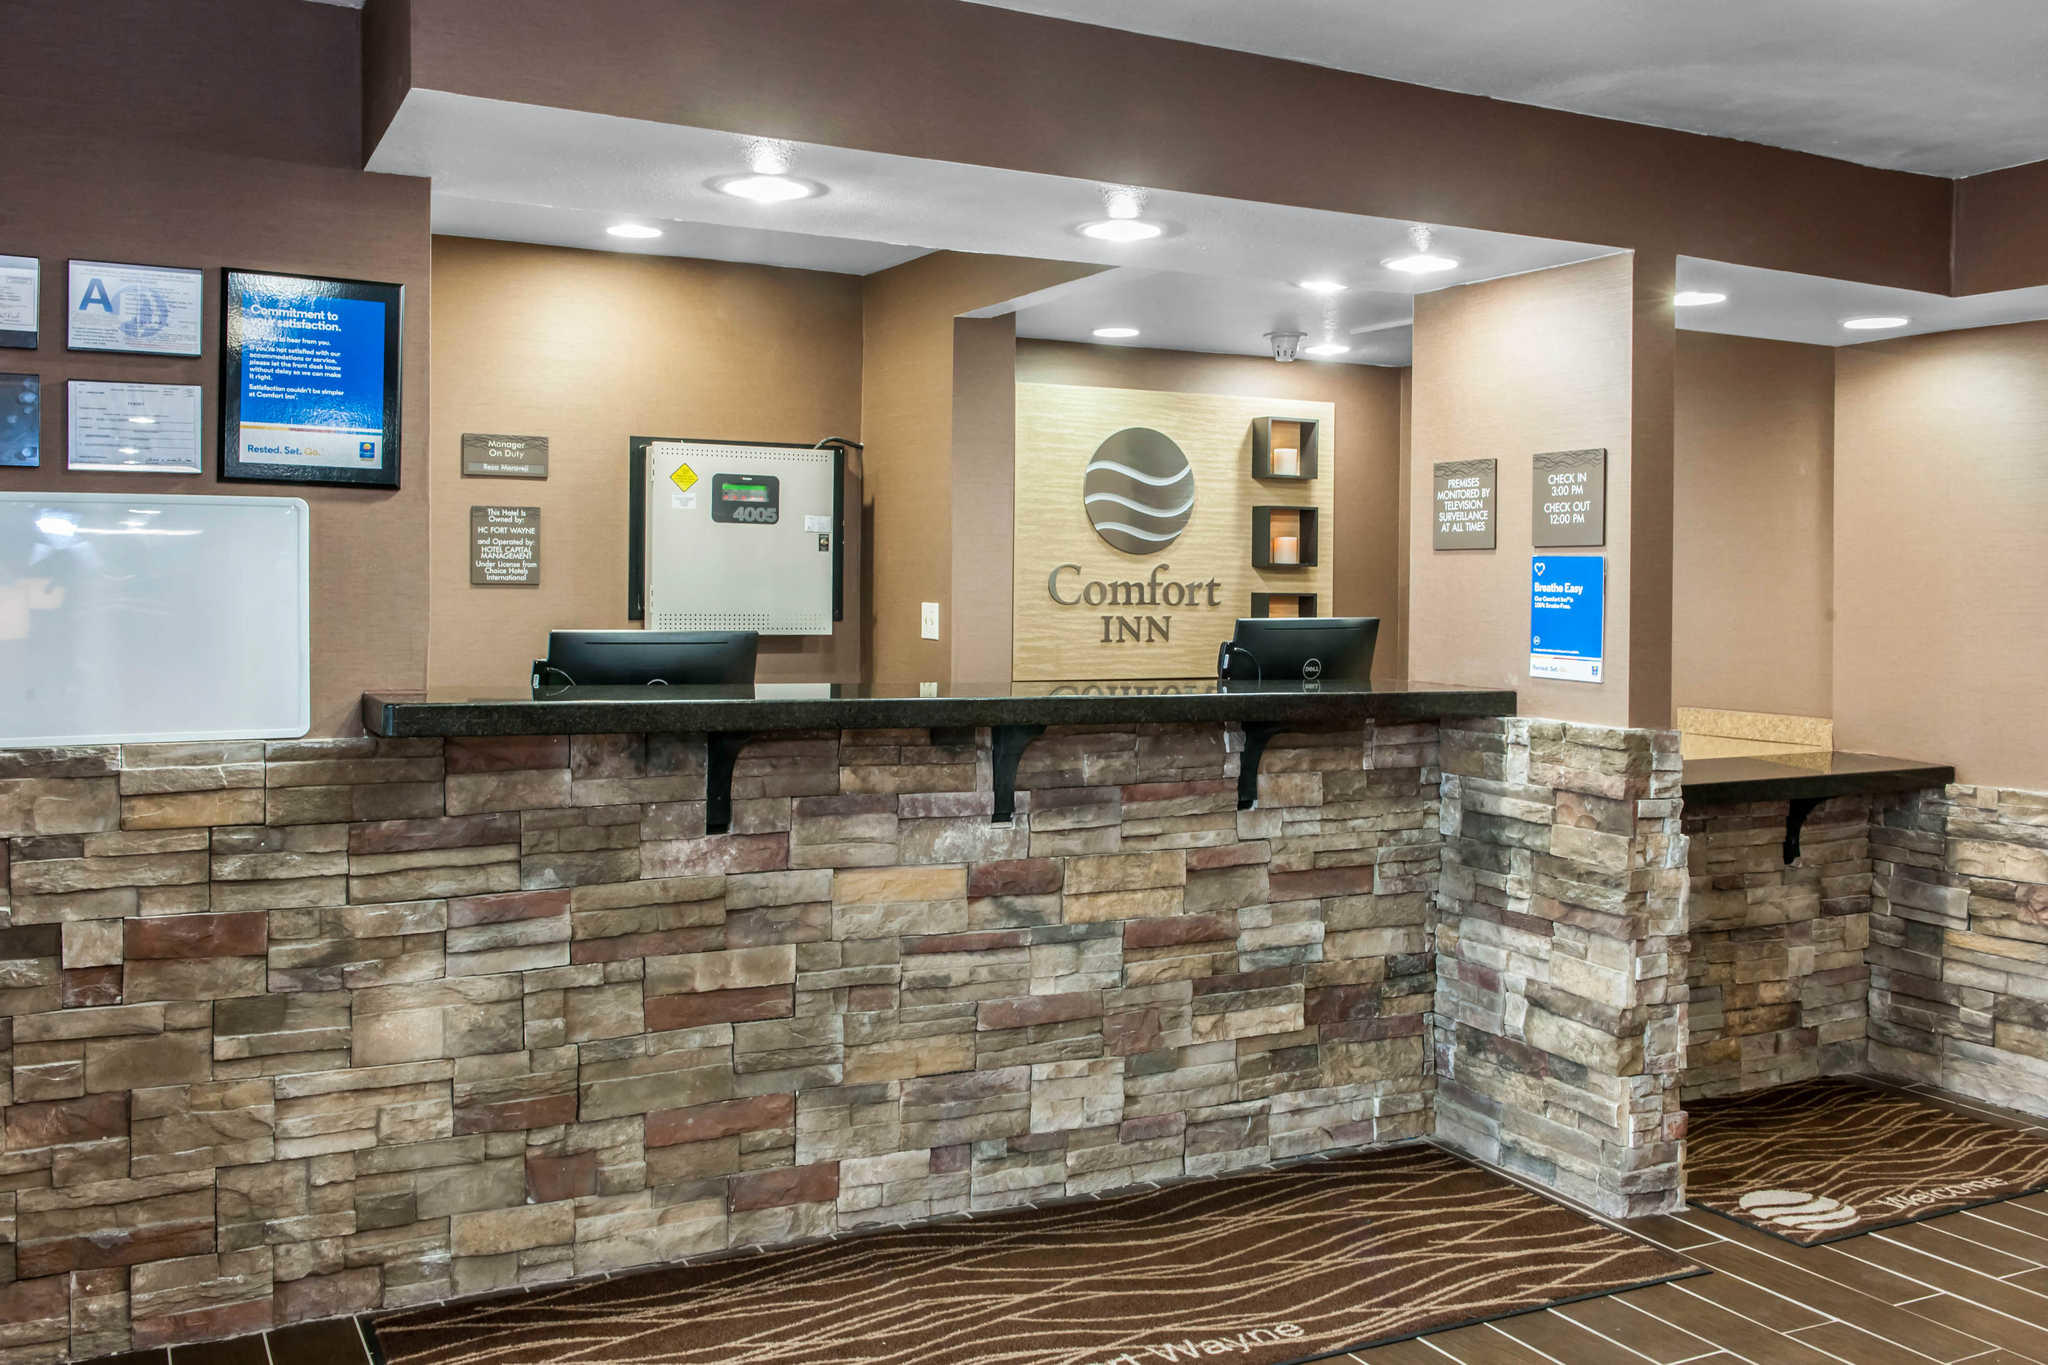 Comfort Inn Fort Wayne Indiana In Localdatabase Com